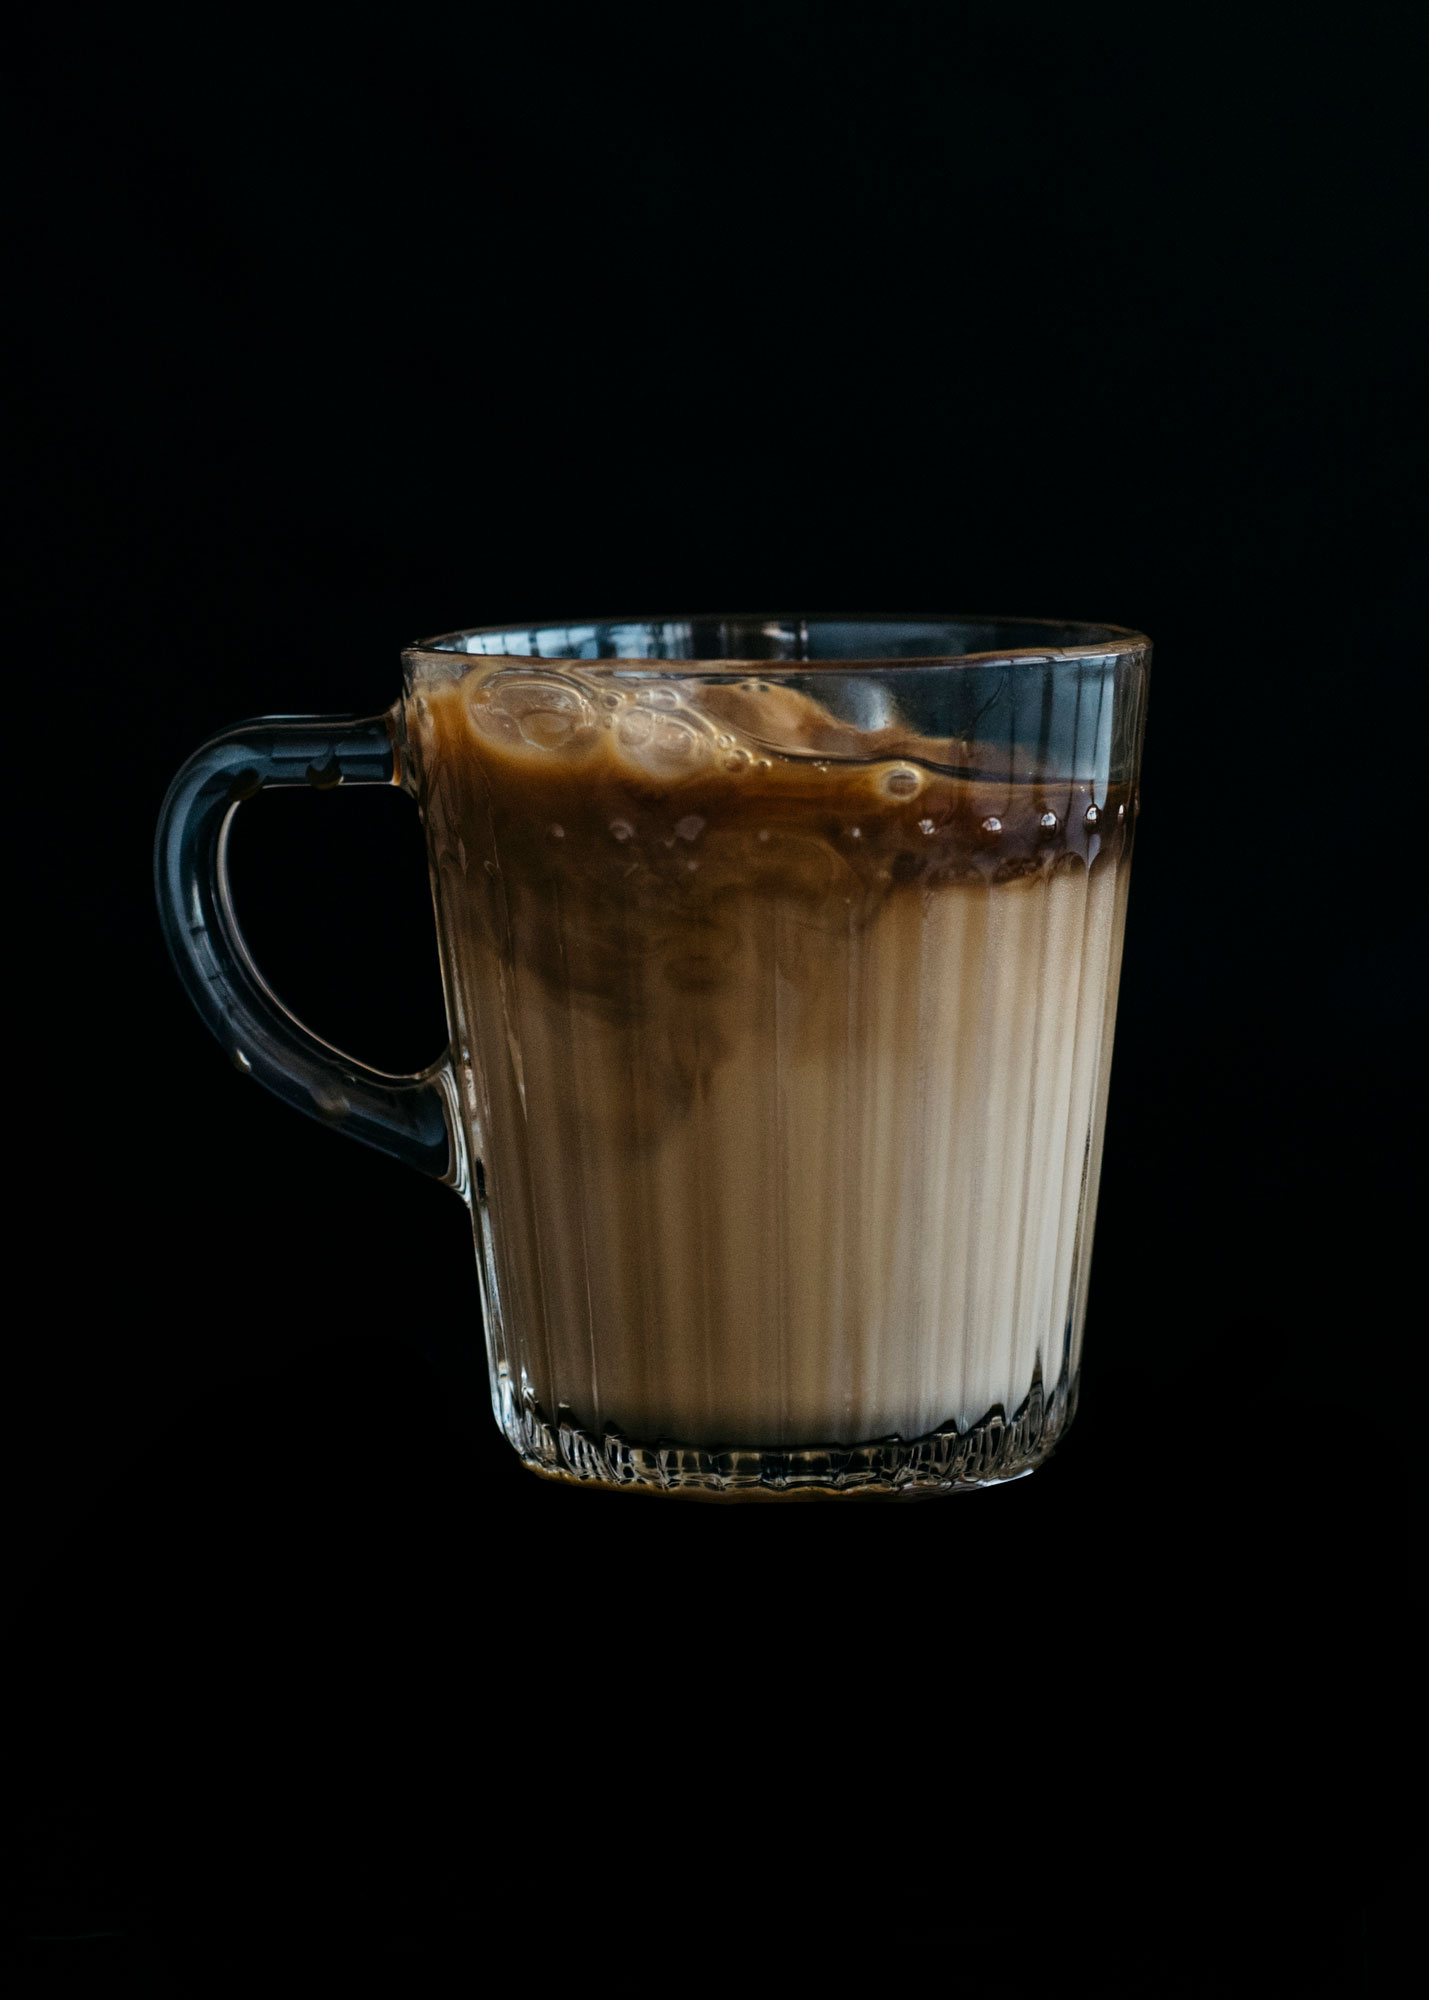 Coffee_Splash_Ikea_cup_Mixing_Rebecca_Peloquin_Los_Angeles_Beverage_Photographer.JPG